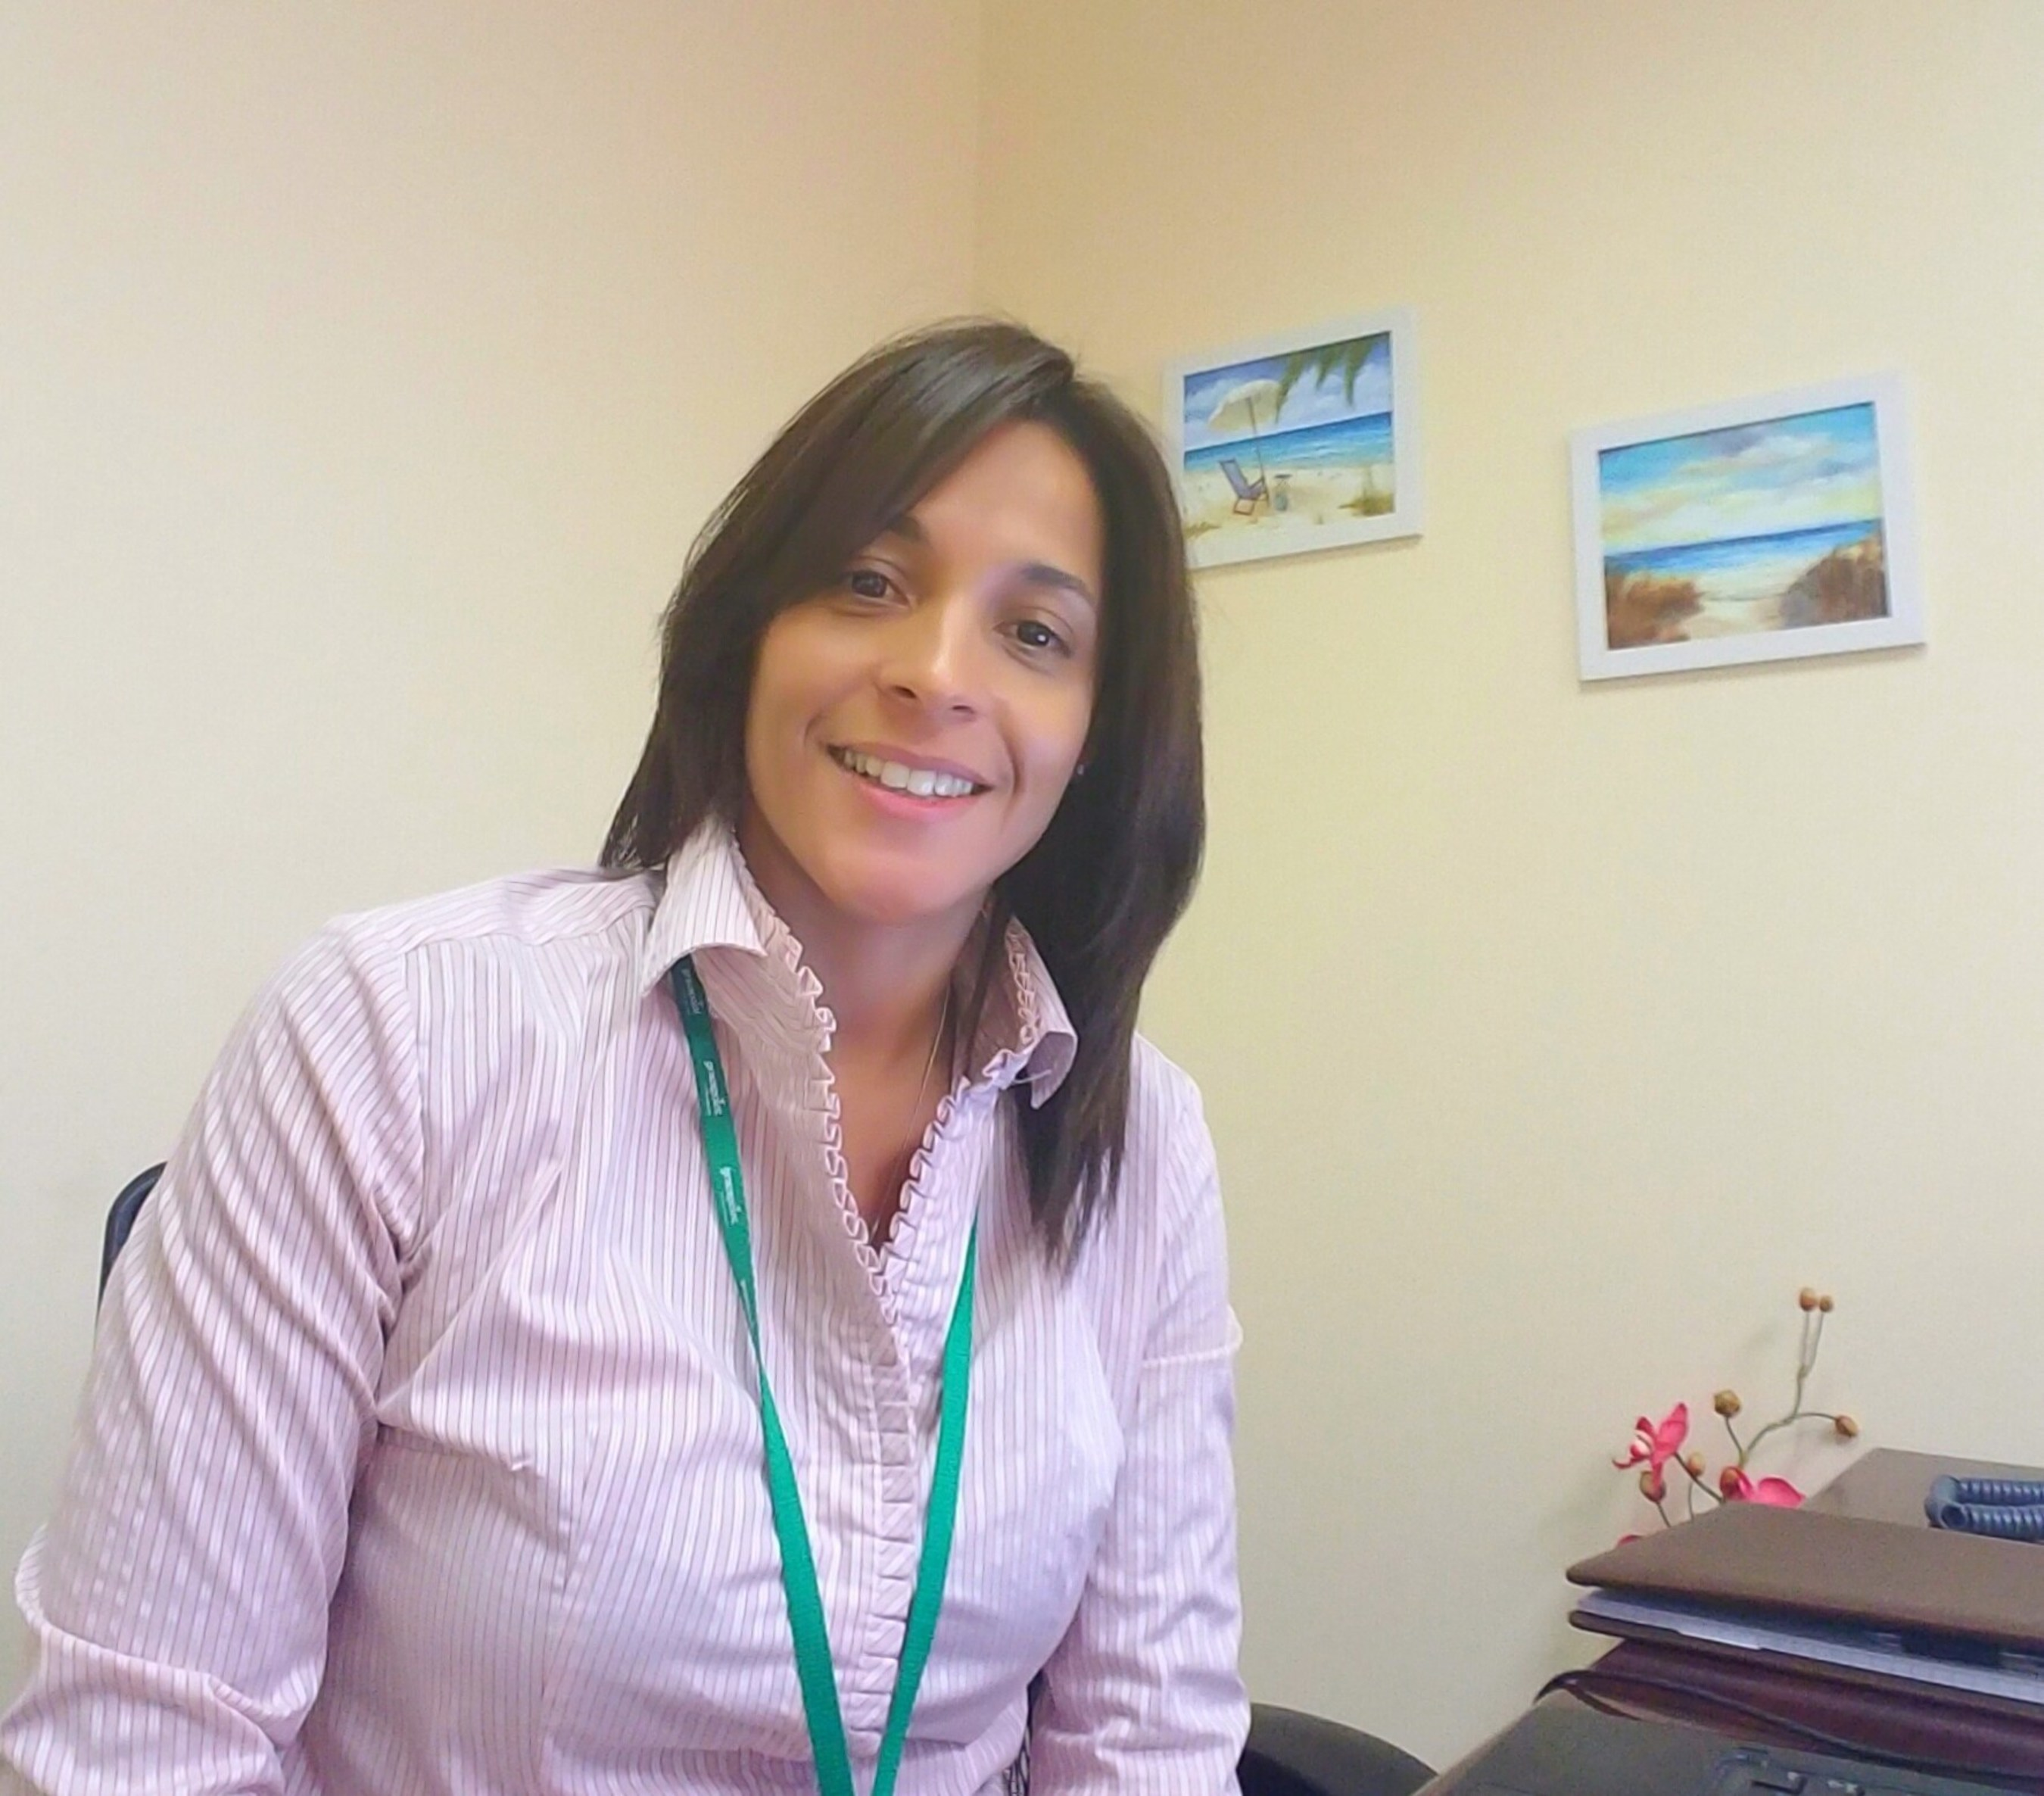 Winner of the Loan Repayment Grant: Ileana Angeles